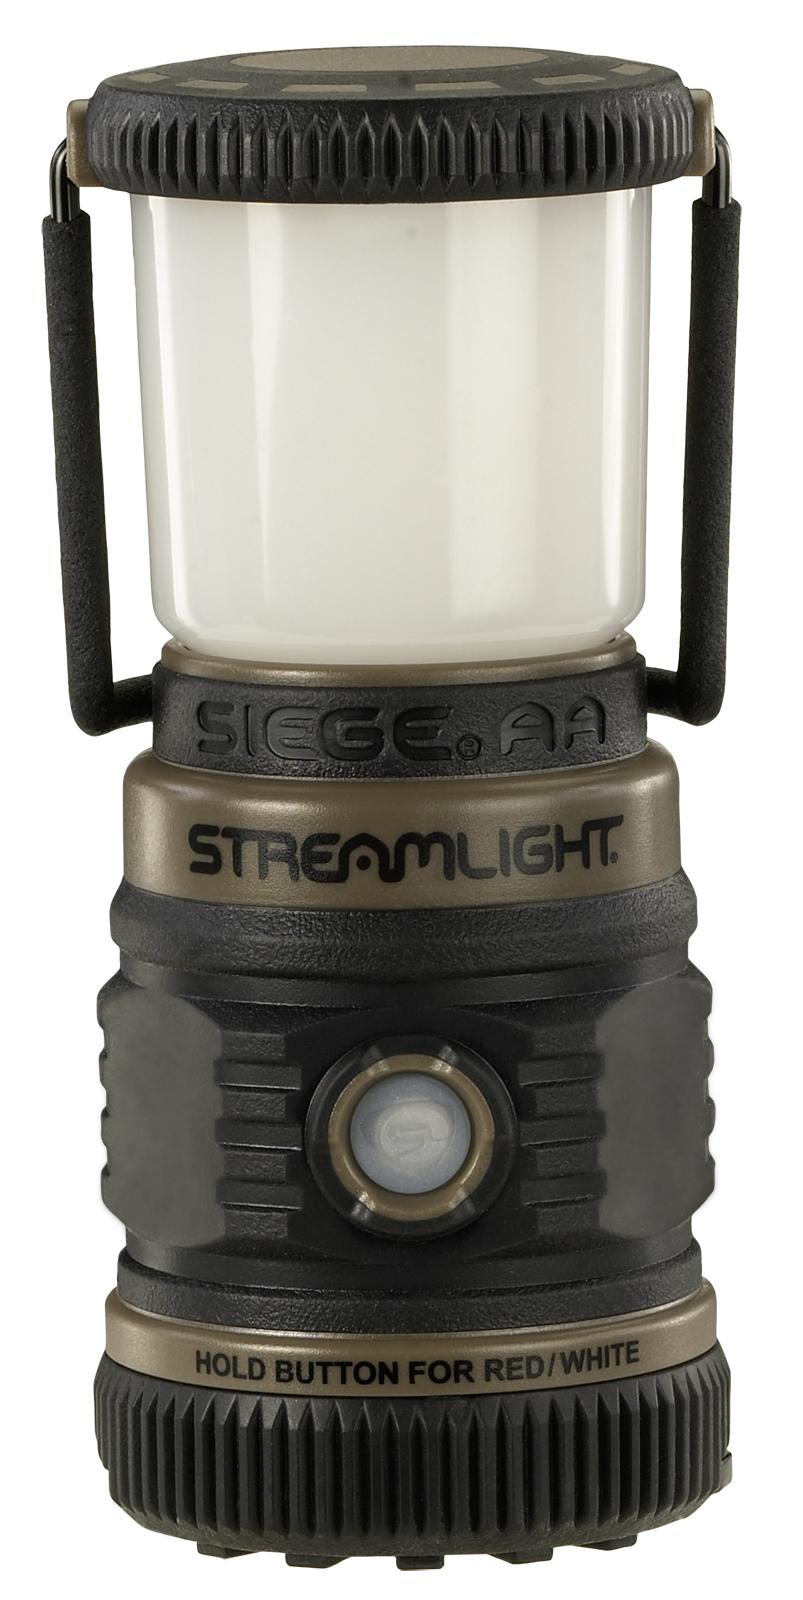 Streamlight The Siege Coyote AA